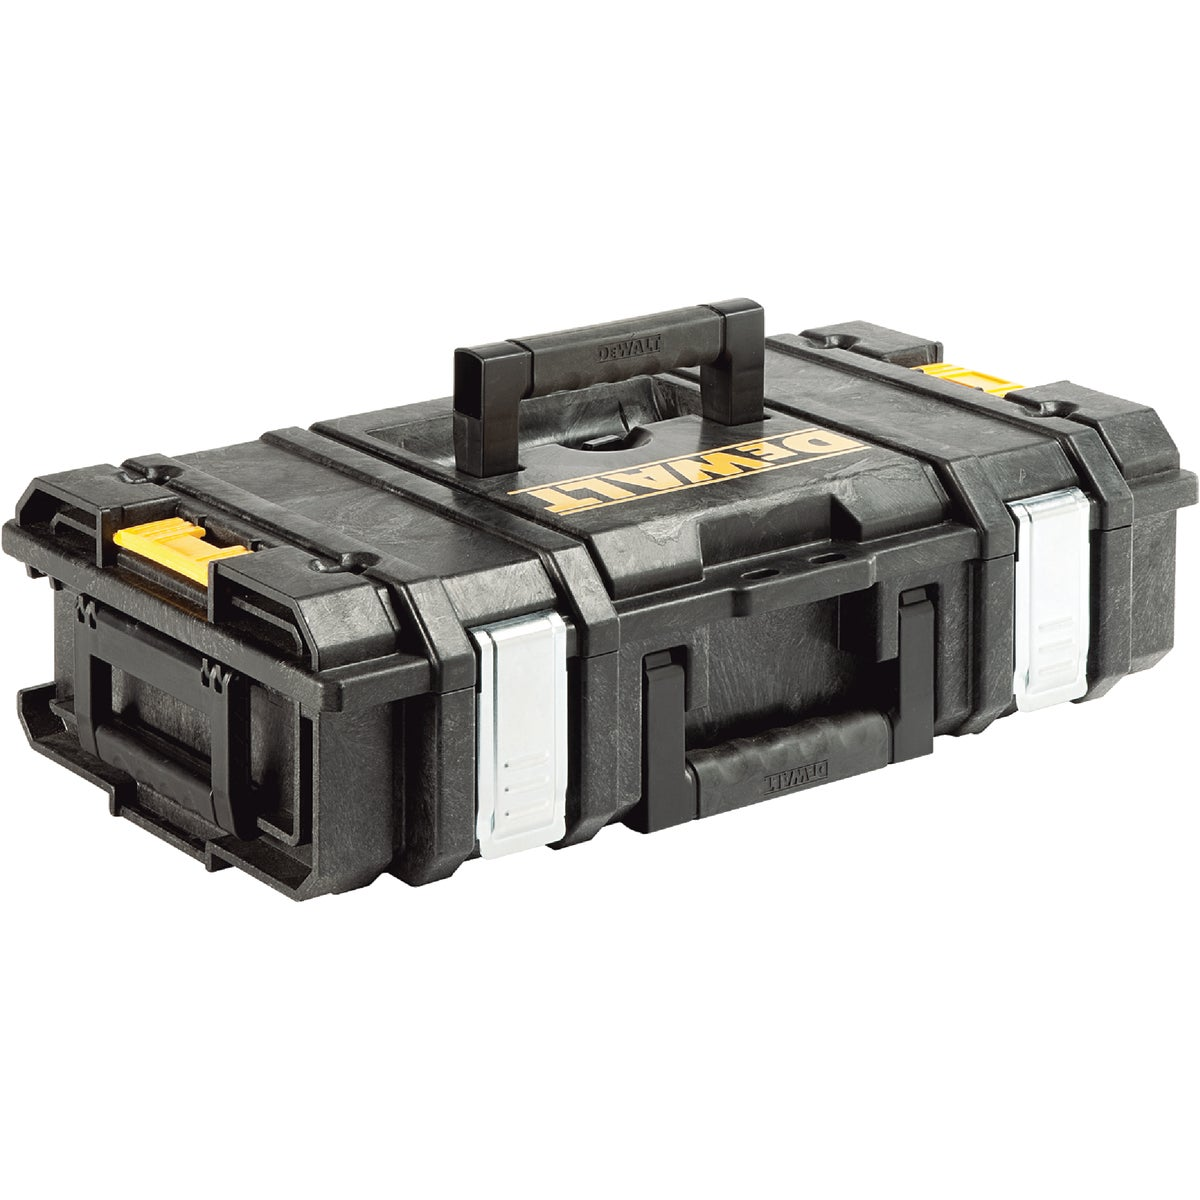 DS150 ORGANIZER BOX